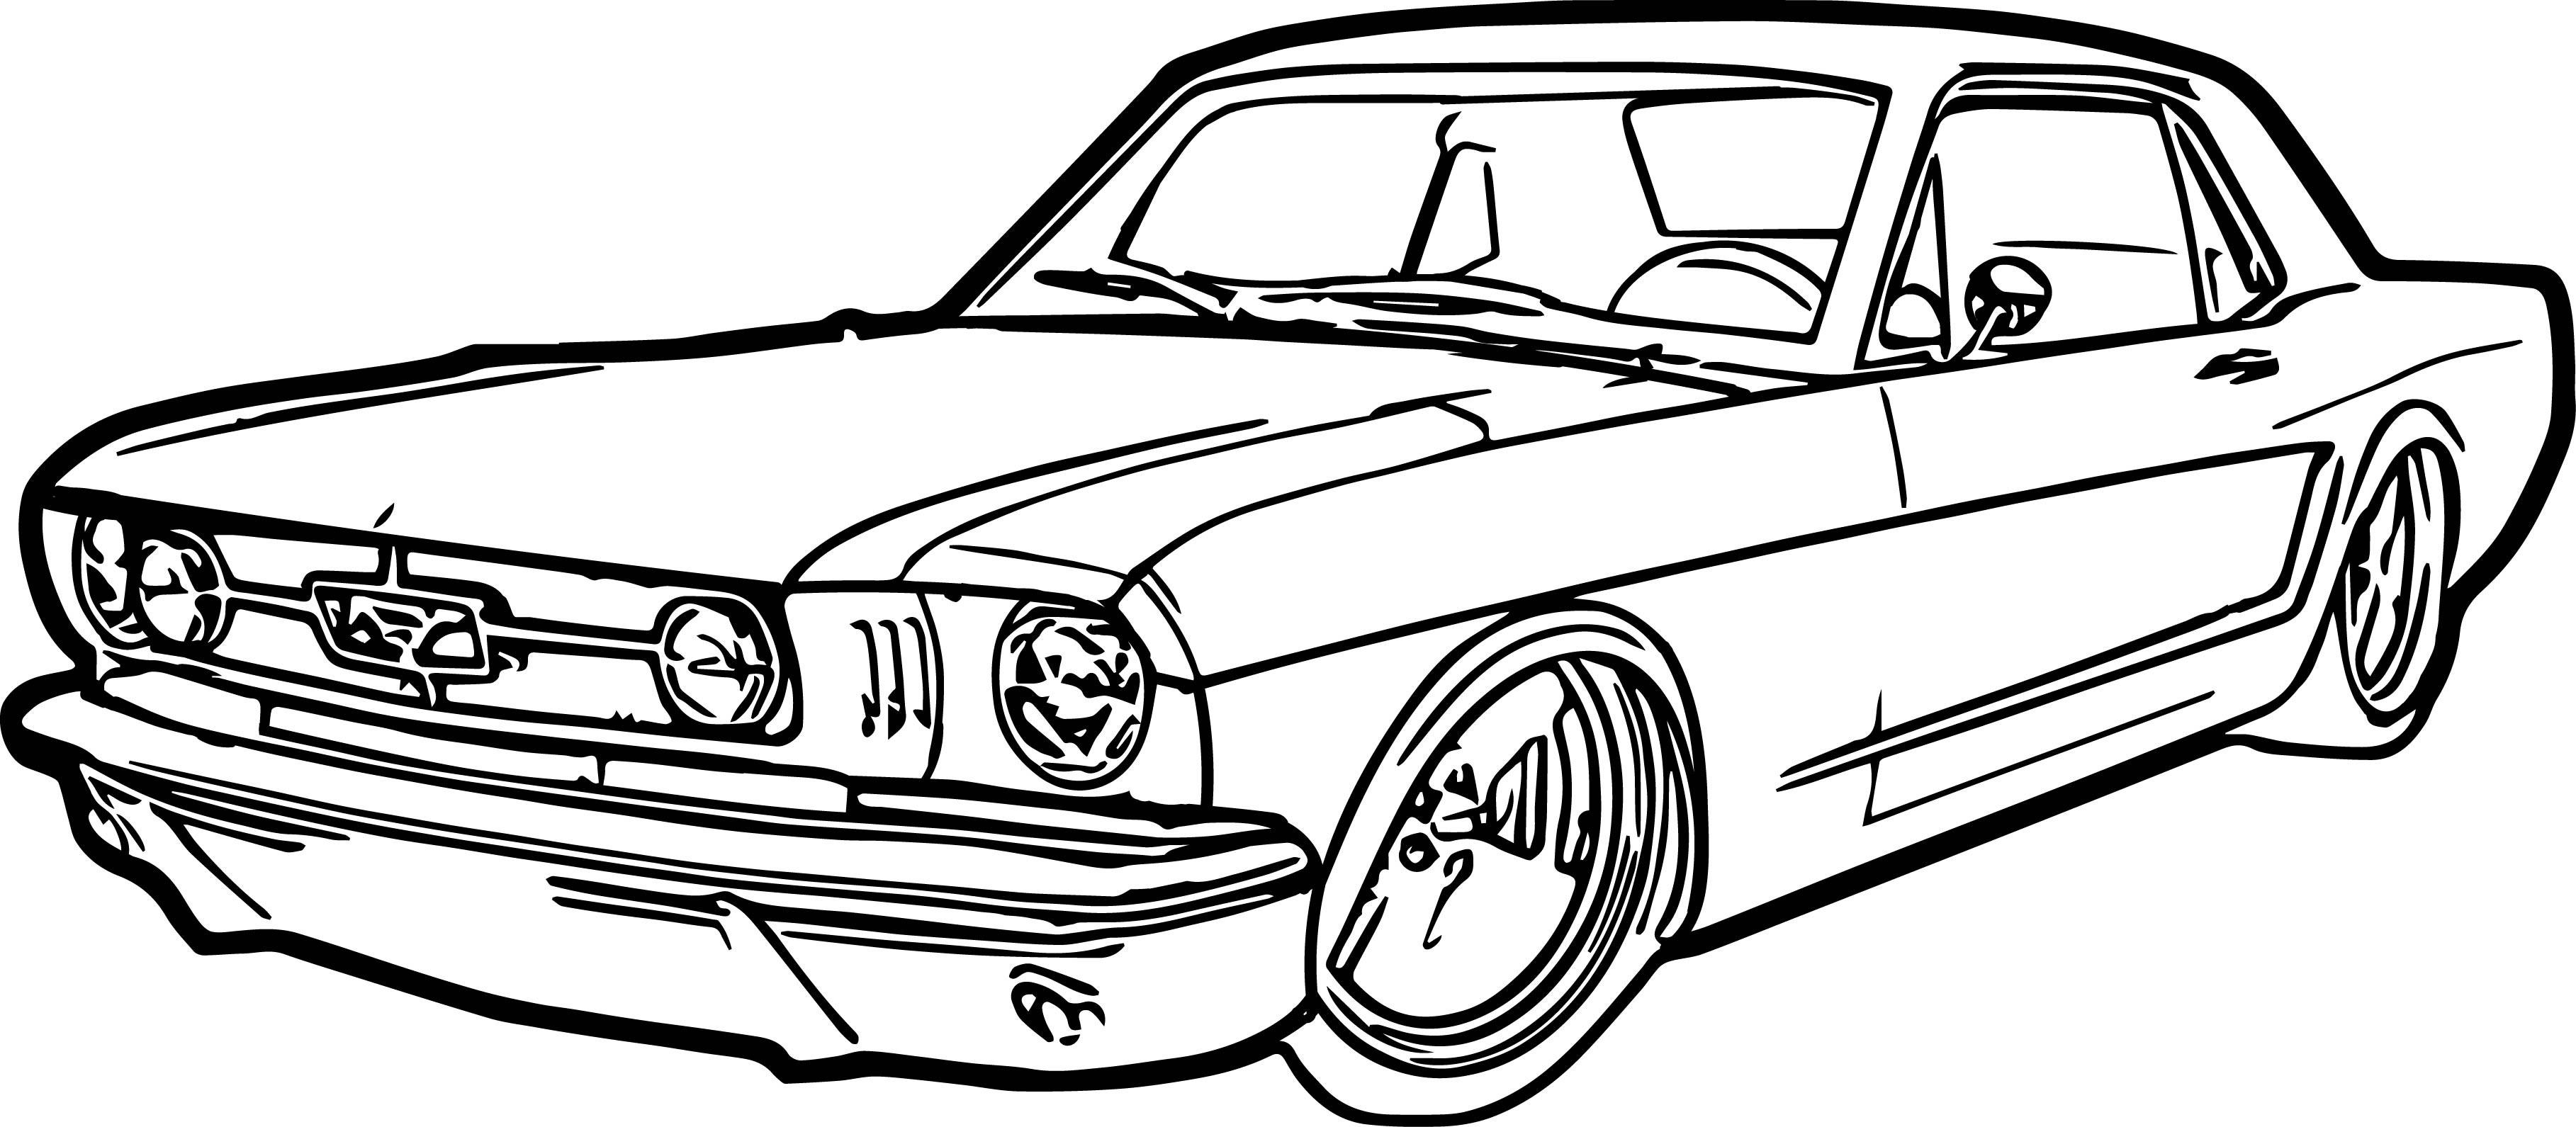 Hot Wheels Car Drawing Free Download Best Hot Wheels Car